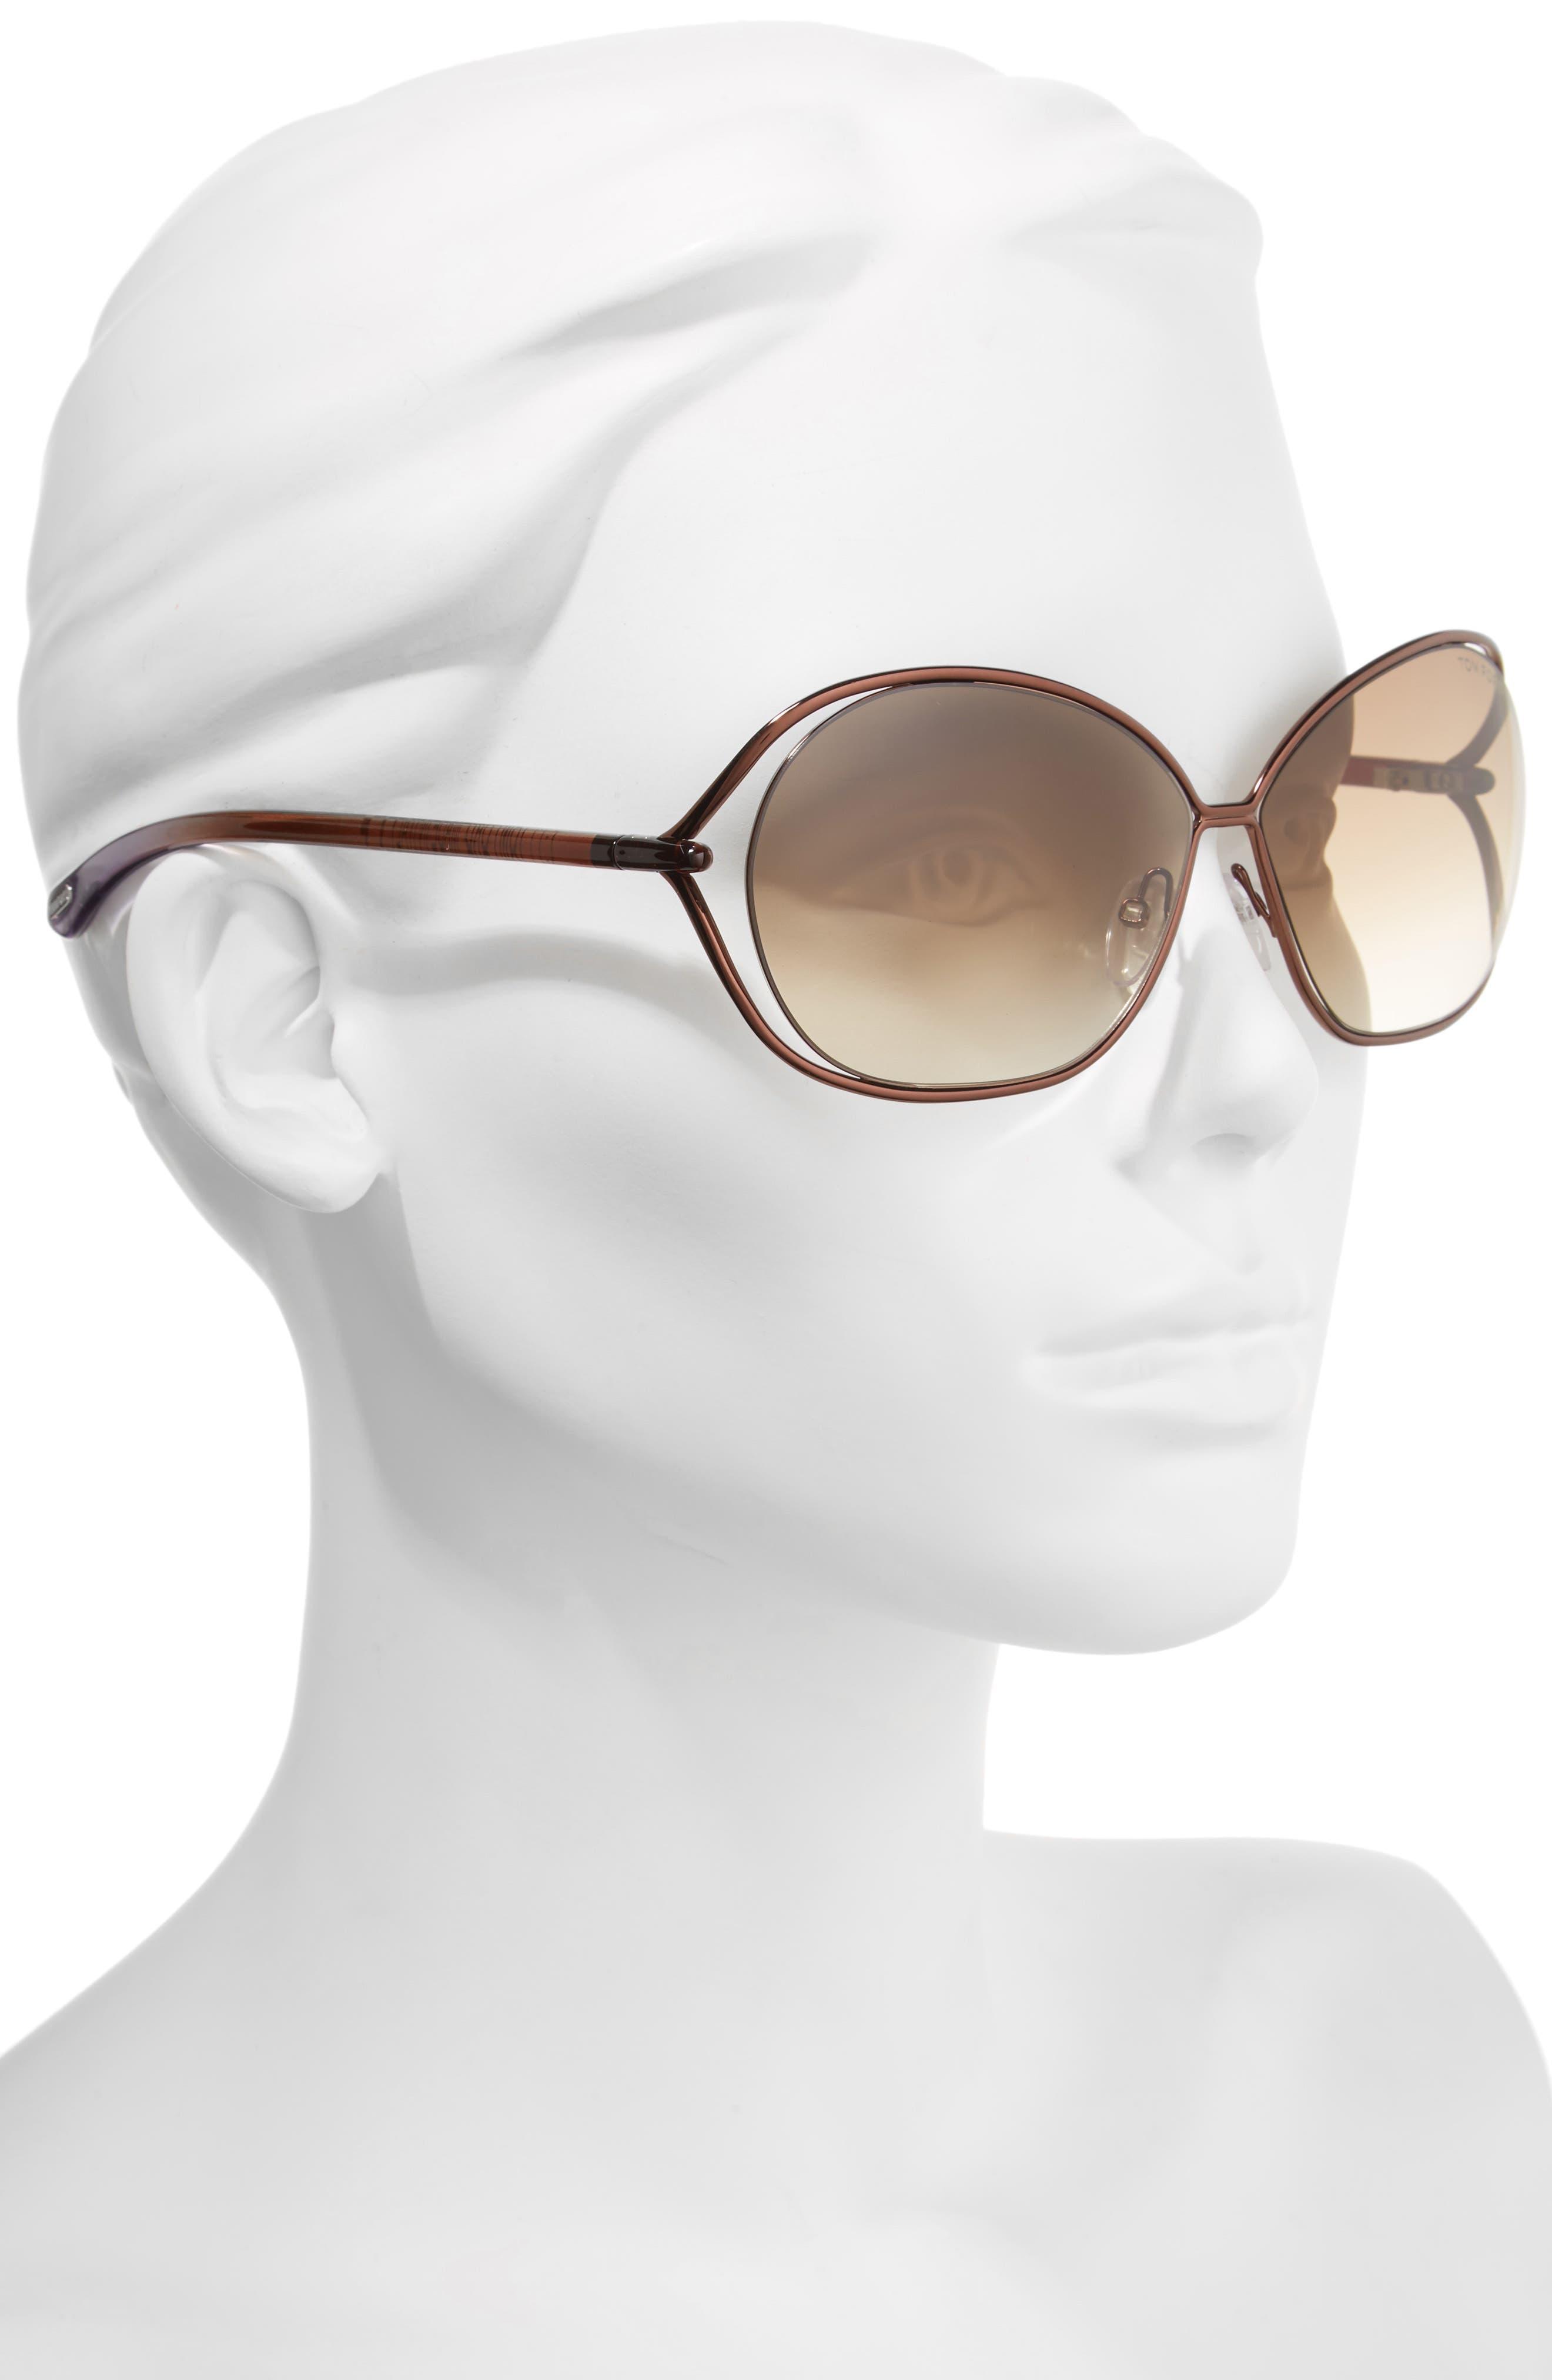 Alternate Image 2  - Tom Ford Carla 66mm Oversized Round Metal Sunglasses